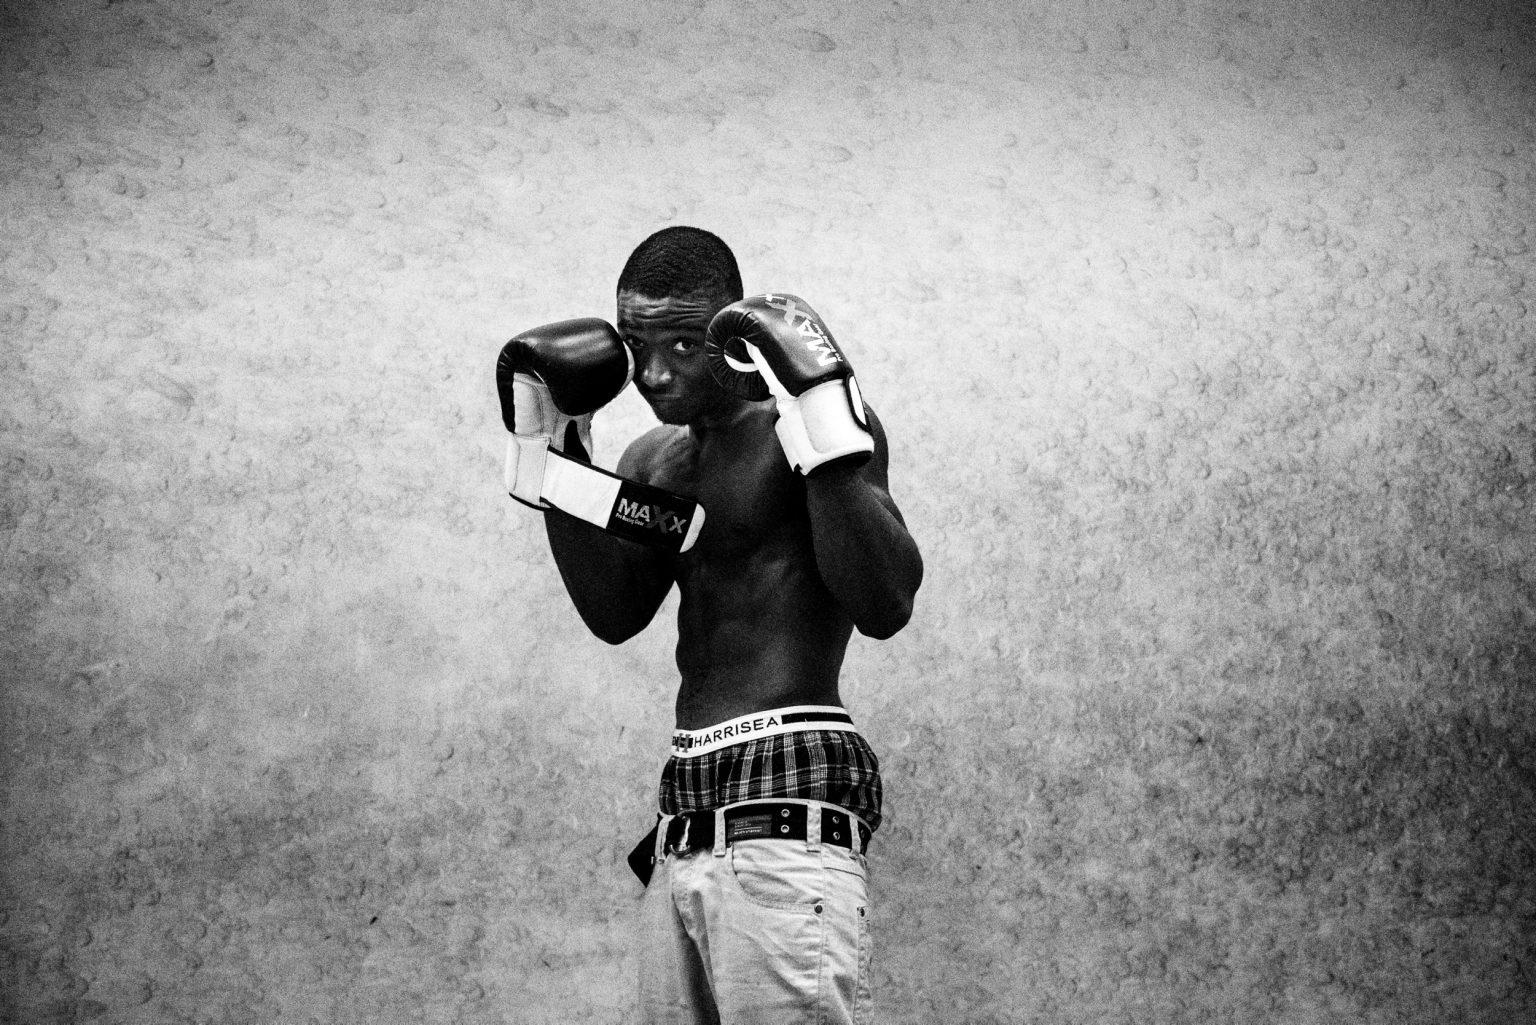 unlicensed-boxing-in-london